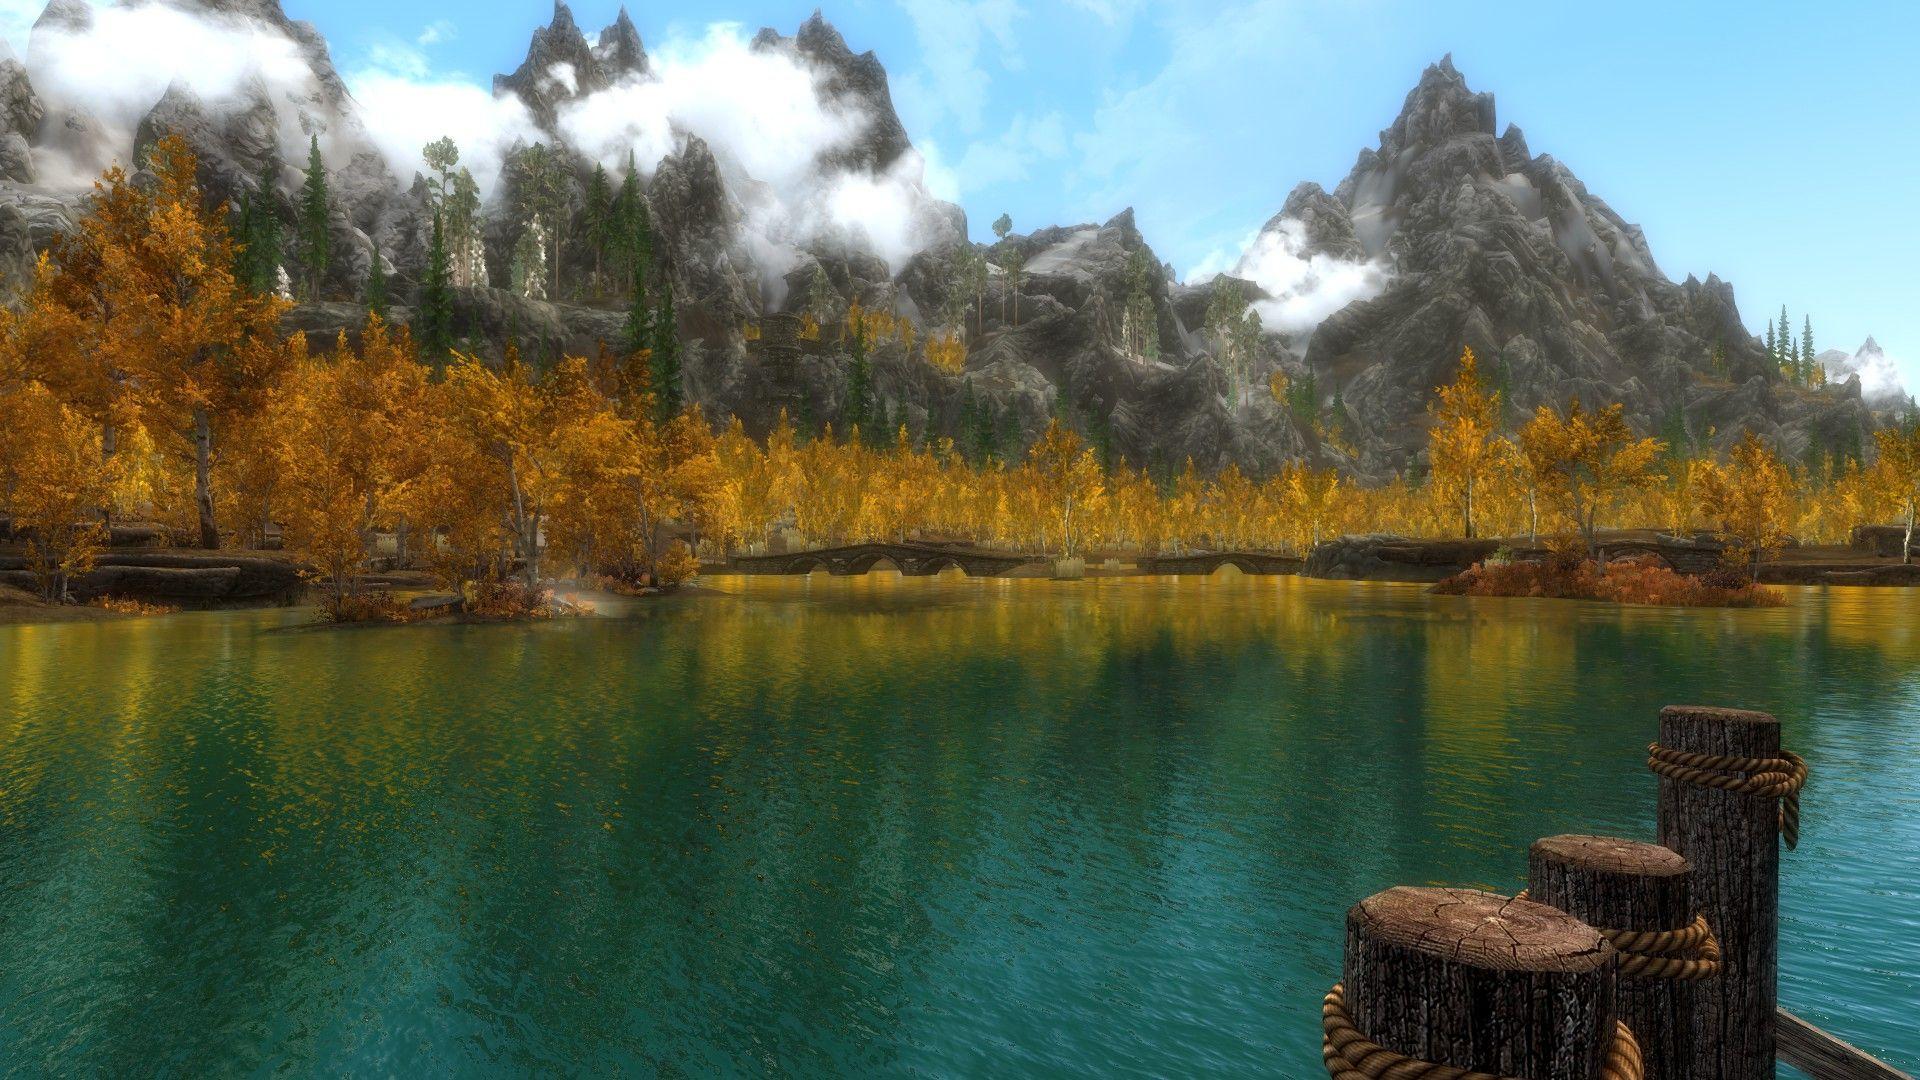 Riften Scenery games Skyrim elderscrolls BE3 gaming